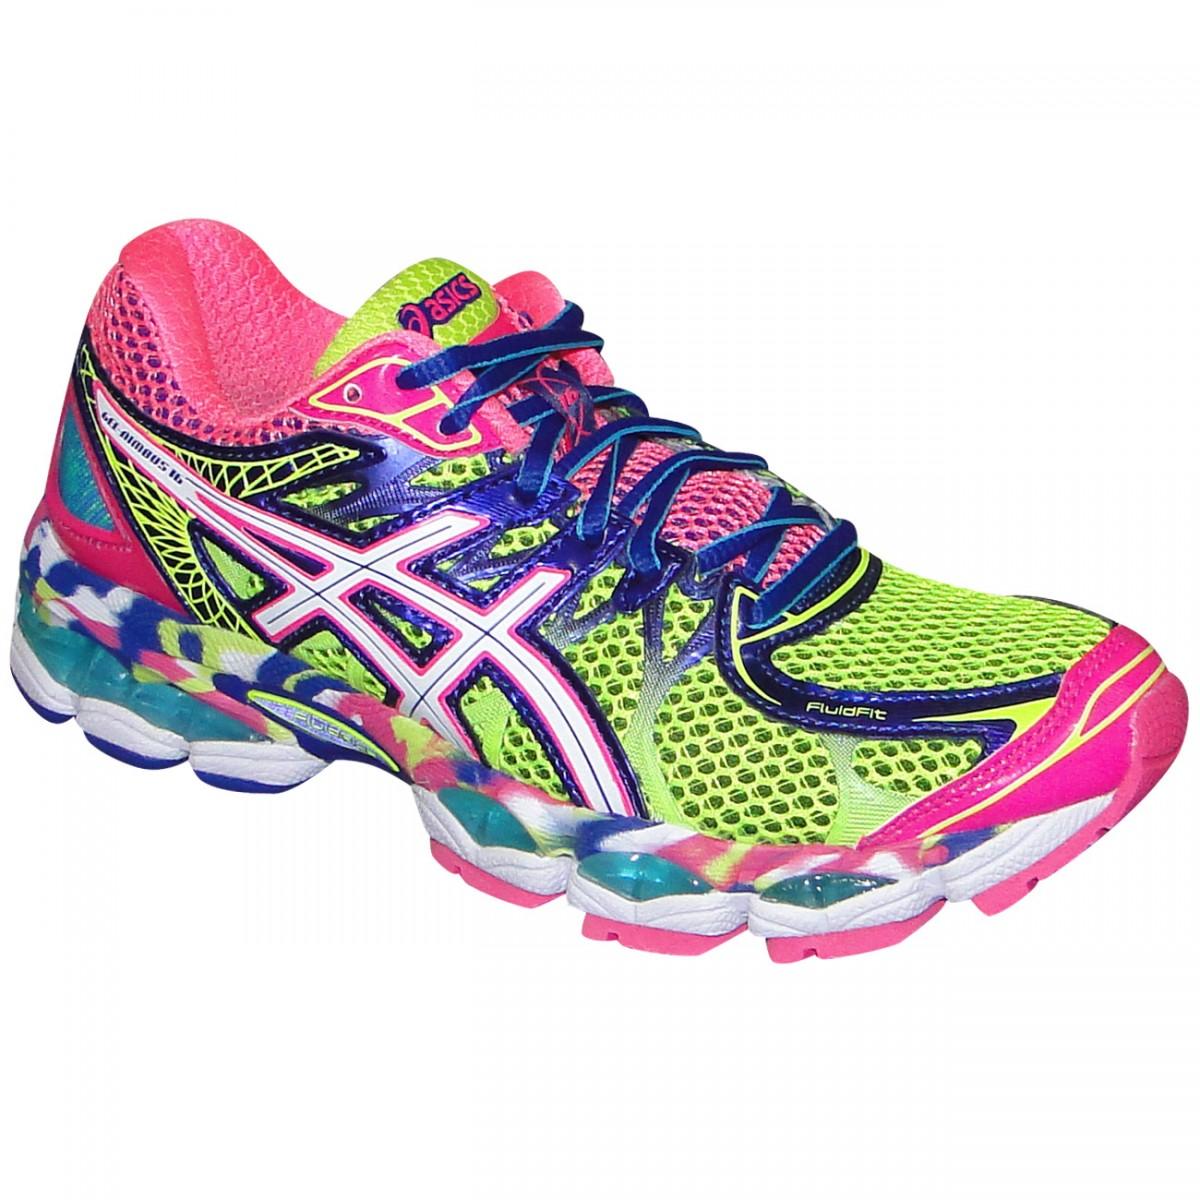 aef39e9c82 Tenis Asics Gel-Nimbus 16 T485Q 0720 - Limão Uva Rosa - Chuteira Nike